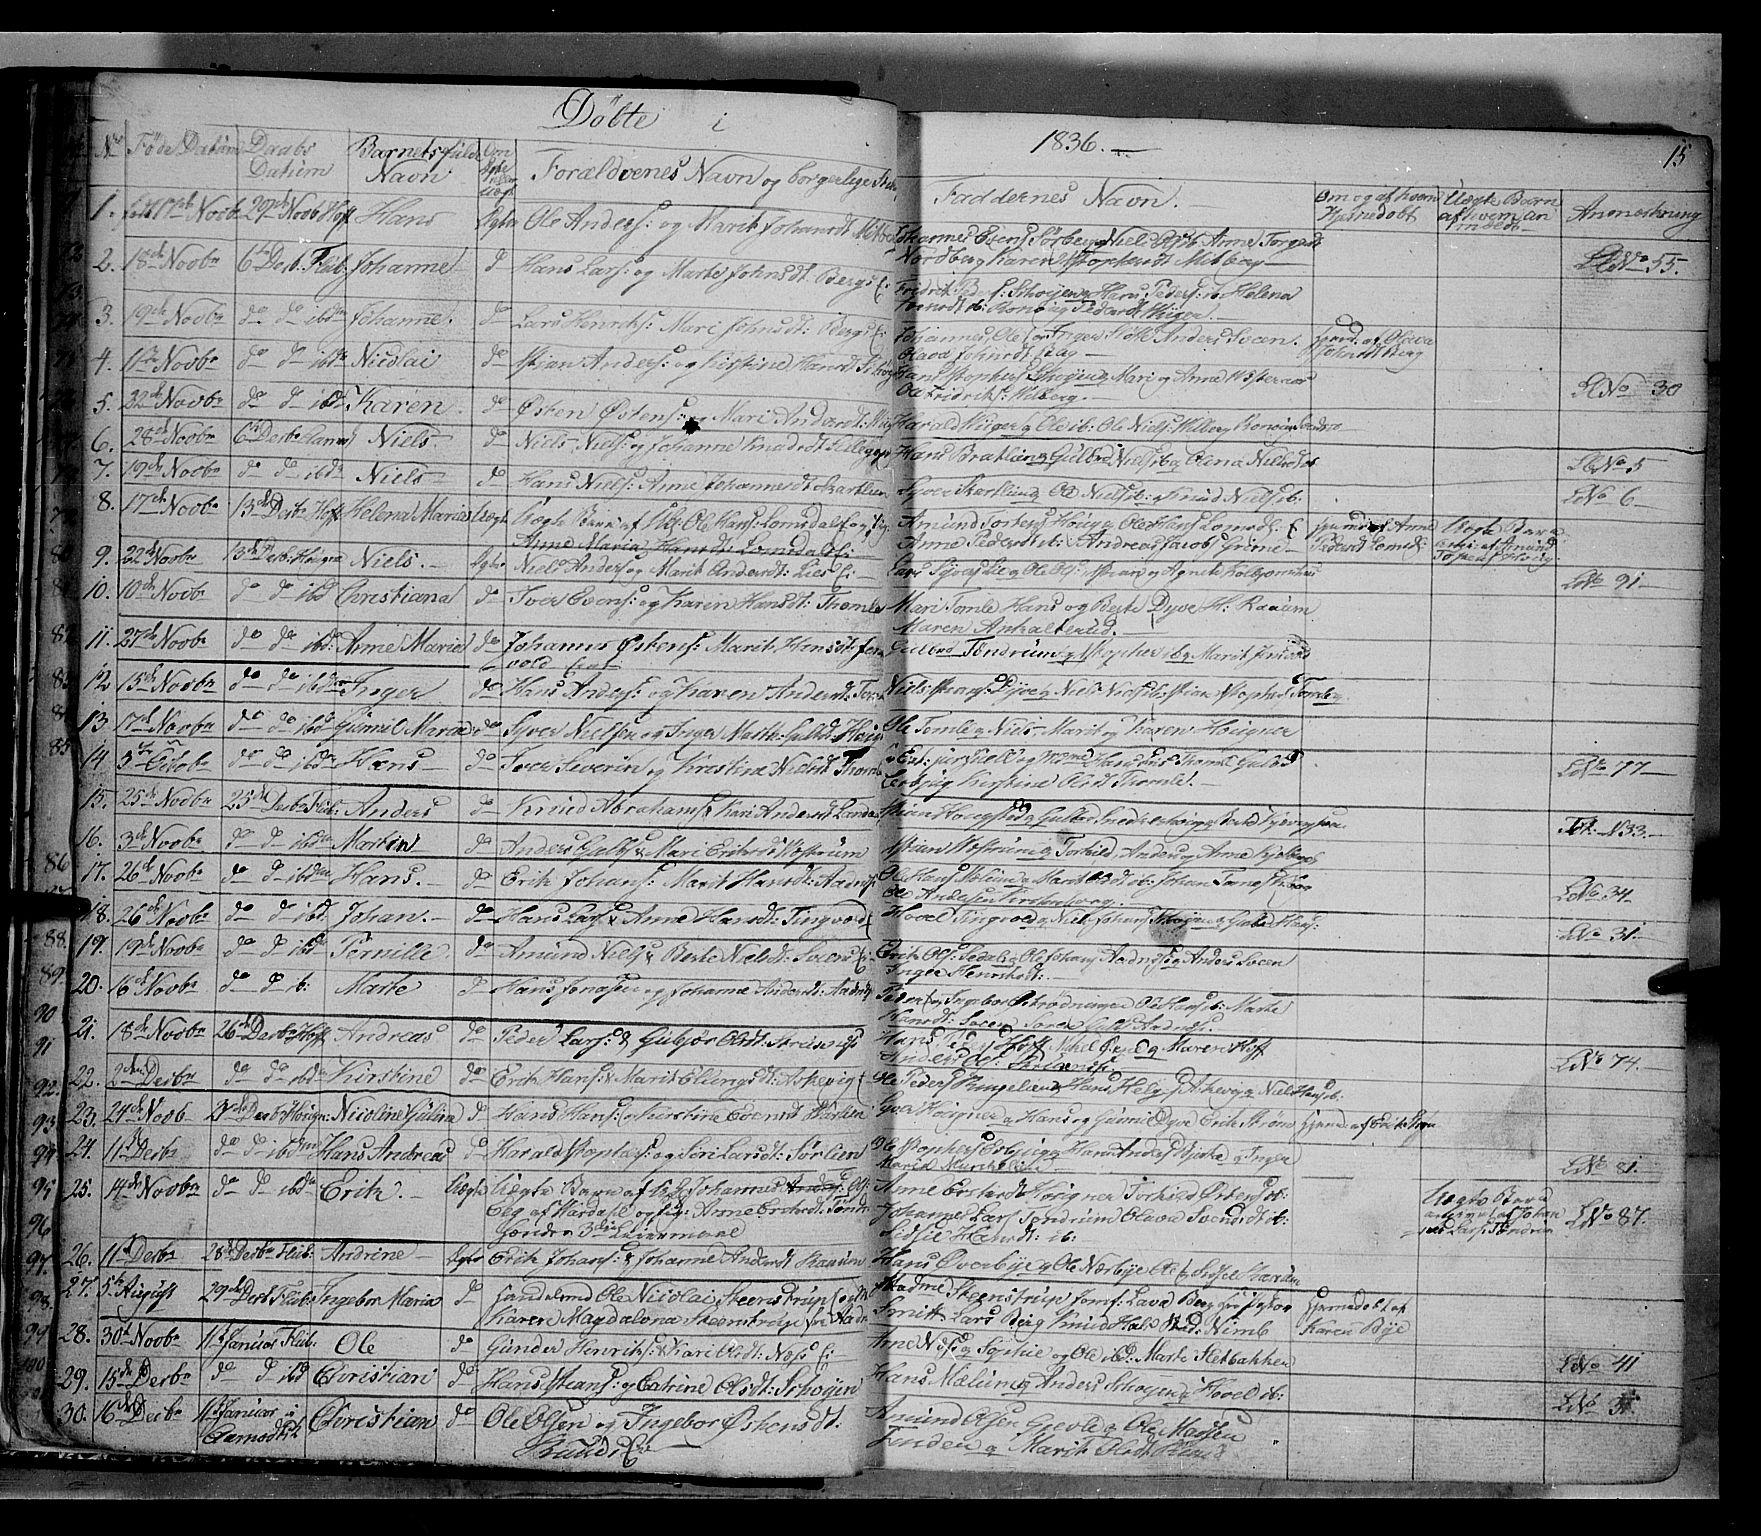 SAH, Land prestekontor, Klokkerbok nr. 2, 1833-1849, s. 15